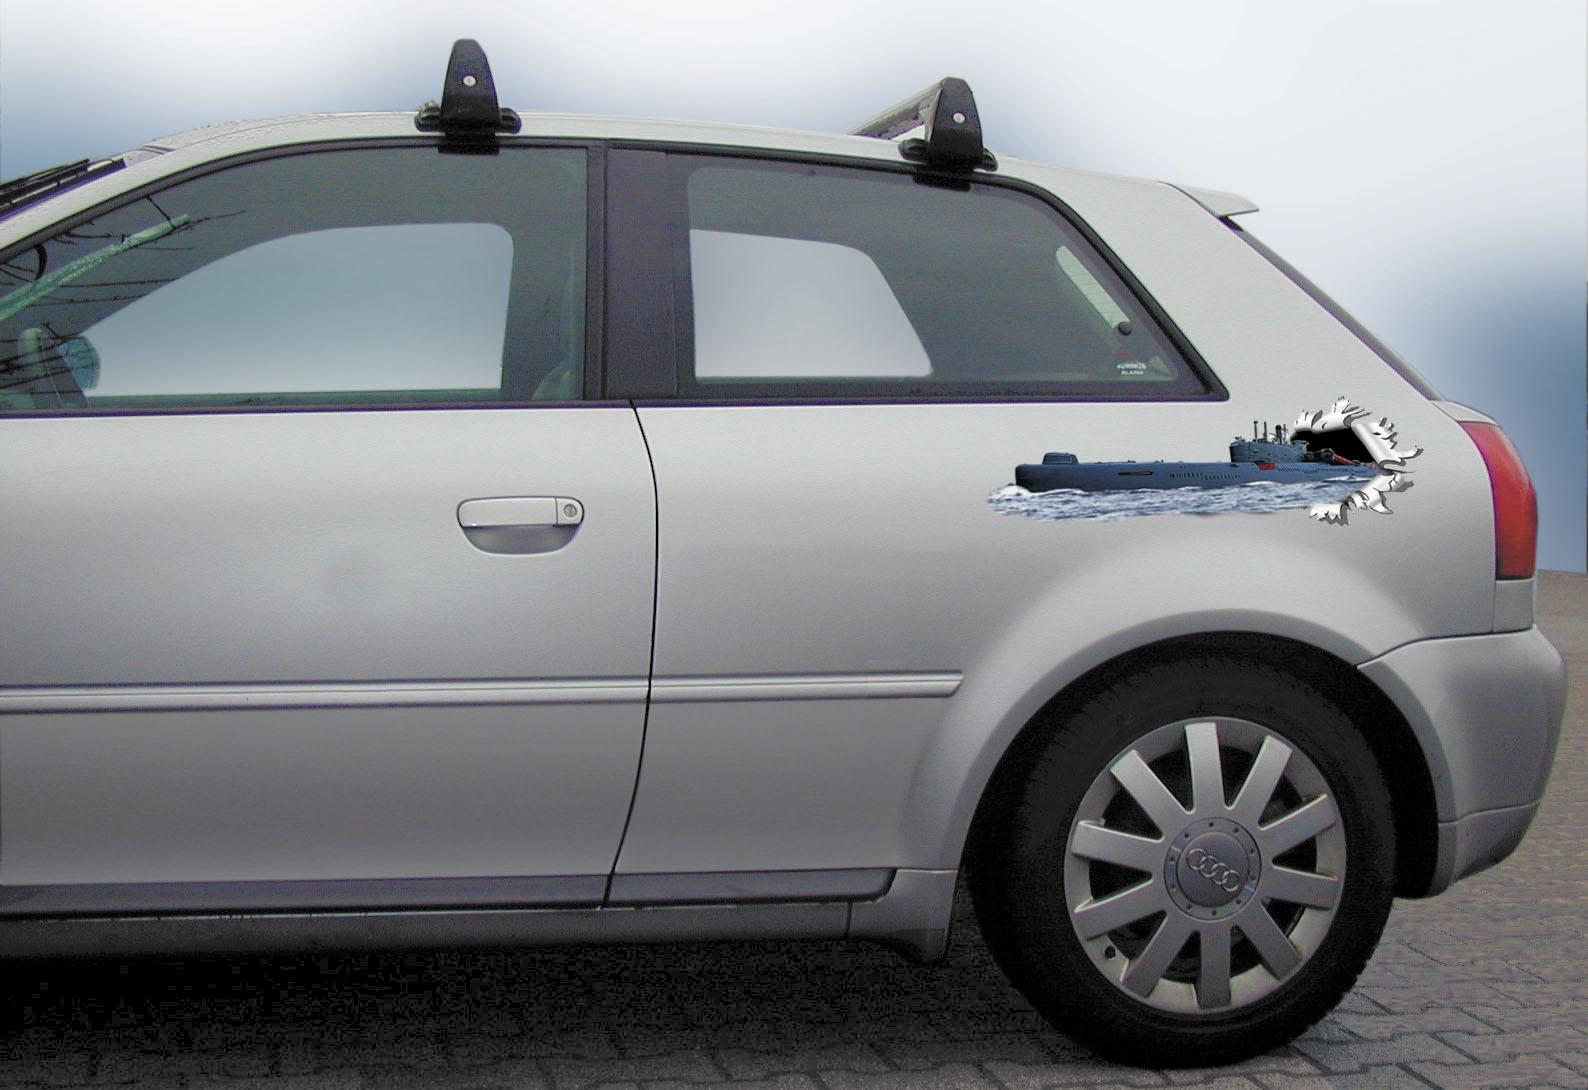 Autocollant trou point d'impact 2-ensemble Droit/grauche 180 x 580 mm motif Sous-marin – Bild 1